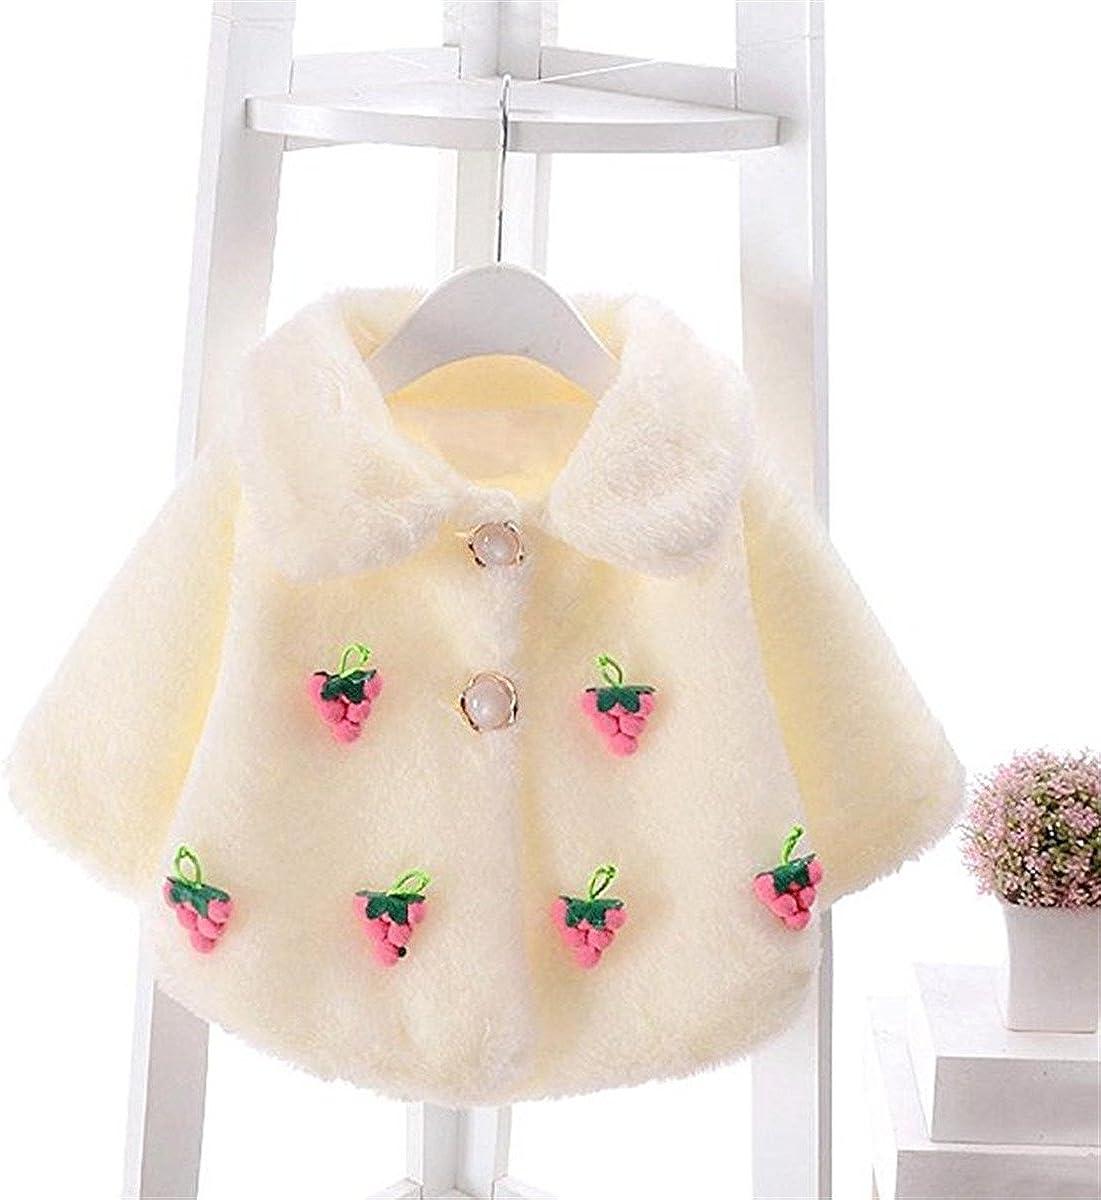 REWANGOING Little Girls Adorable Princess Grape Thick Fur Warm Jacket Outwear Coat Cloak